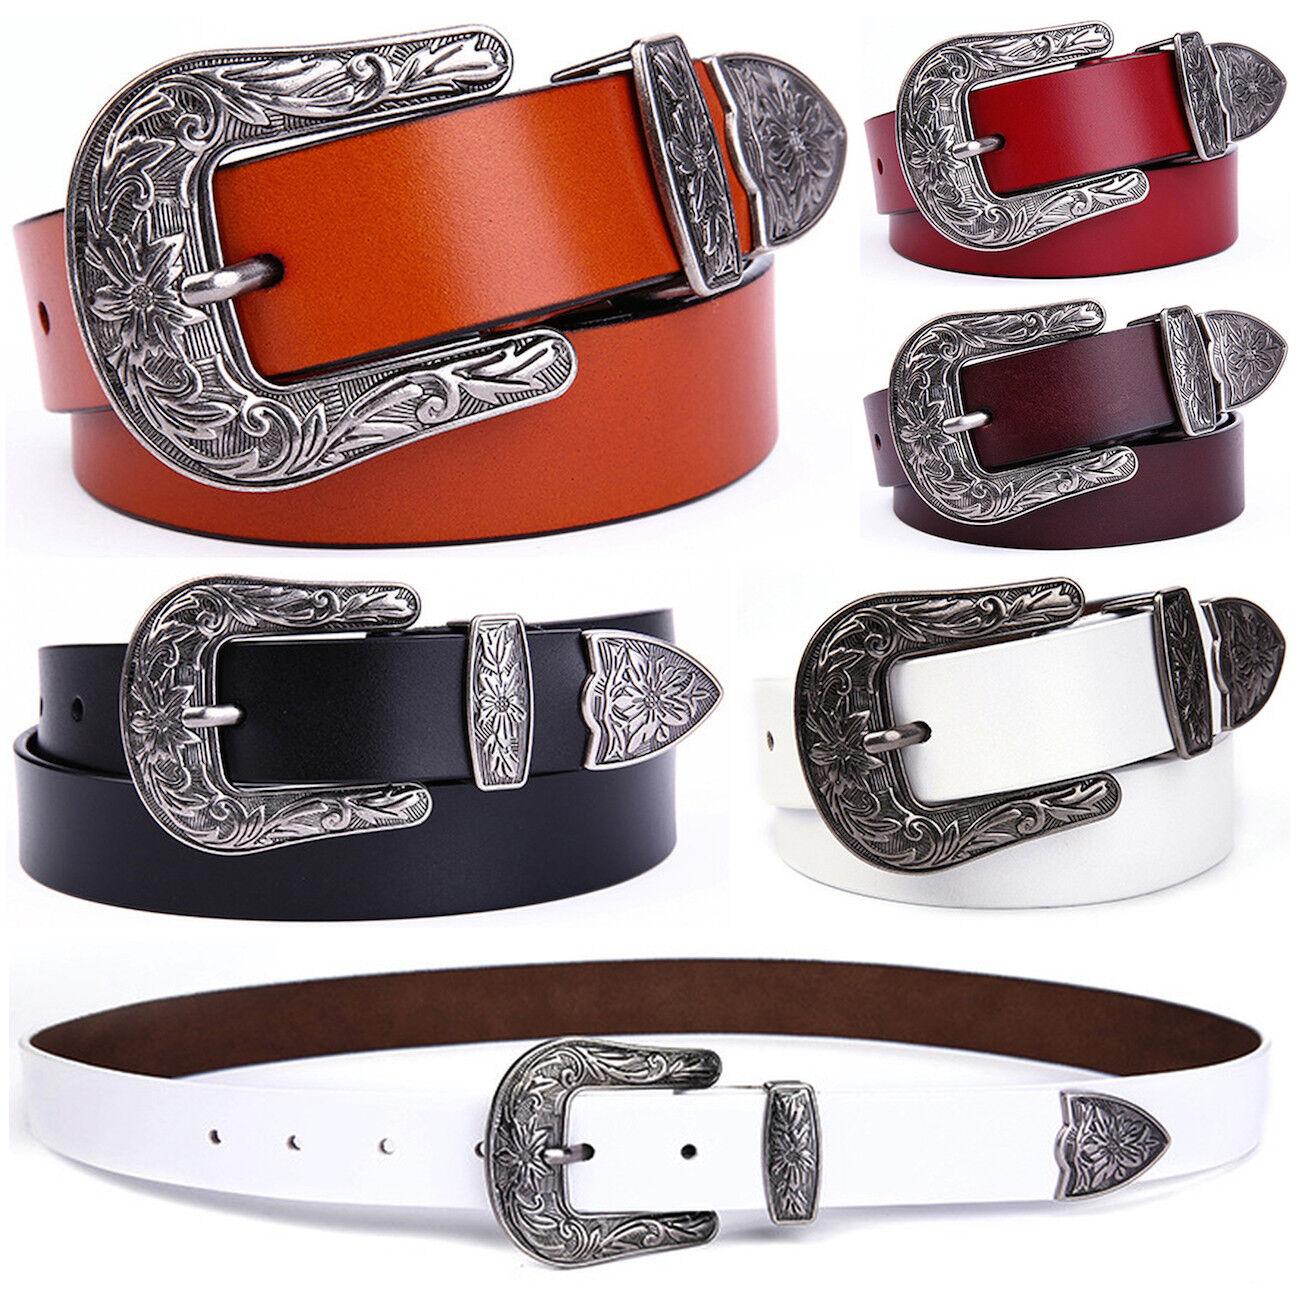 Women's Vintage Western Floral Buckle Cowgirl Handcrafted Genuine Leather Belt Belts